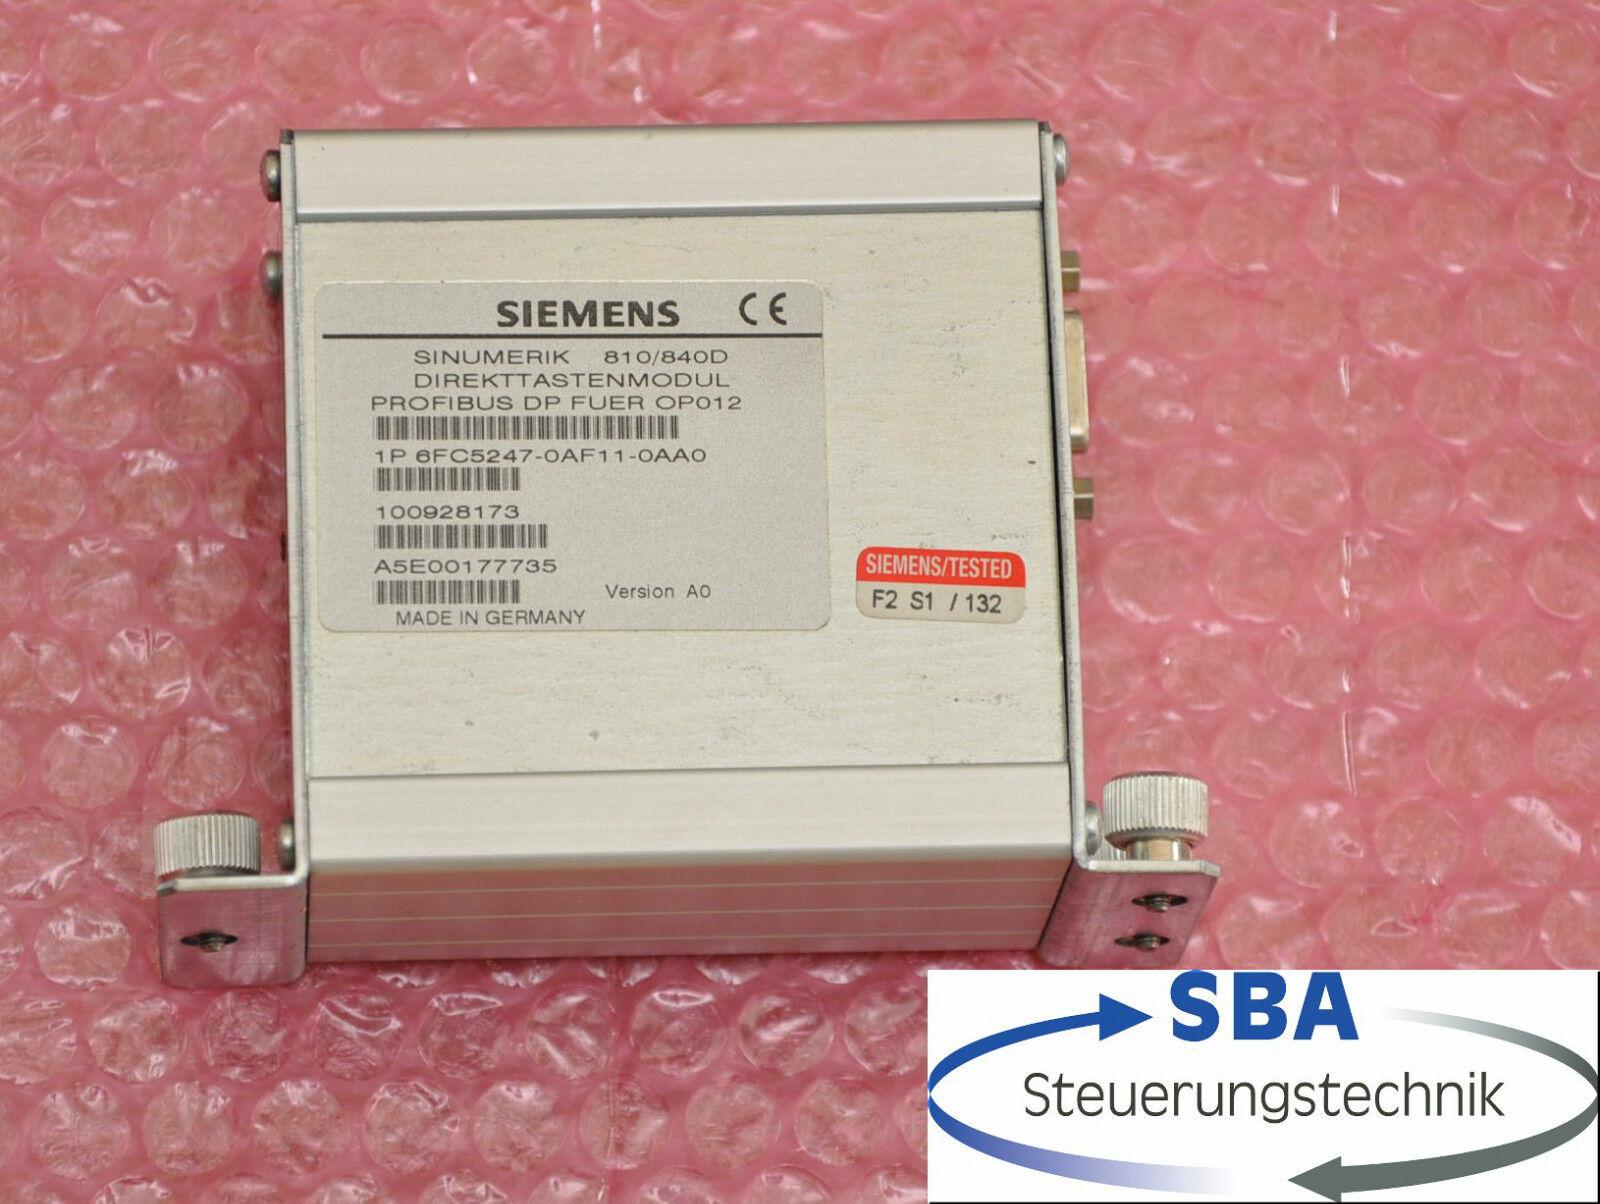 Laser Entfernungsmesser Keyence : Siemens sinumerik 810 840d direkttastenmodul 6fc5247 0af11 0aa0 vers